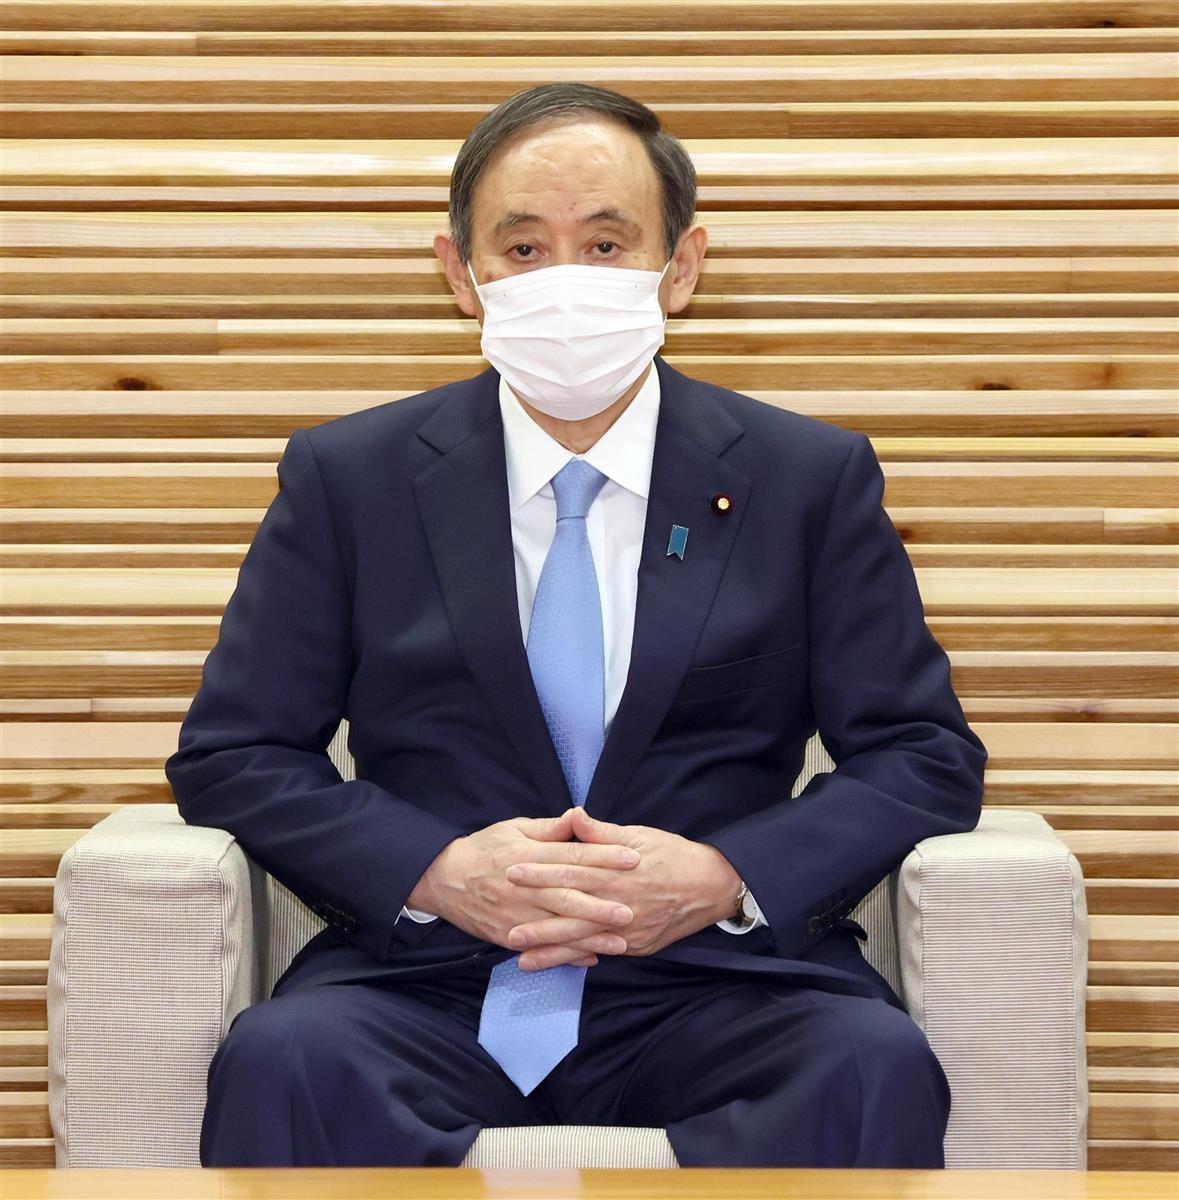 閣議に臨む菅義偉首相=19日午前、首相官邸(春名中撮影)